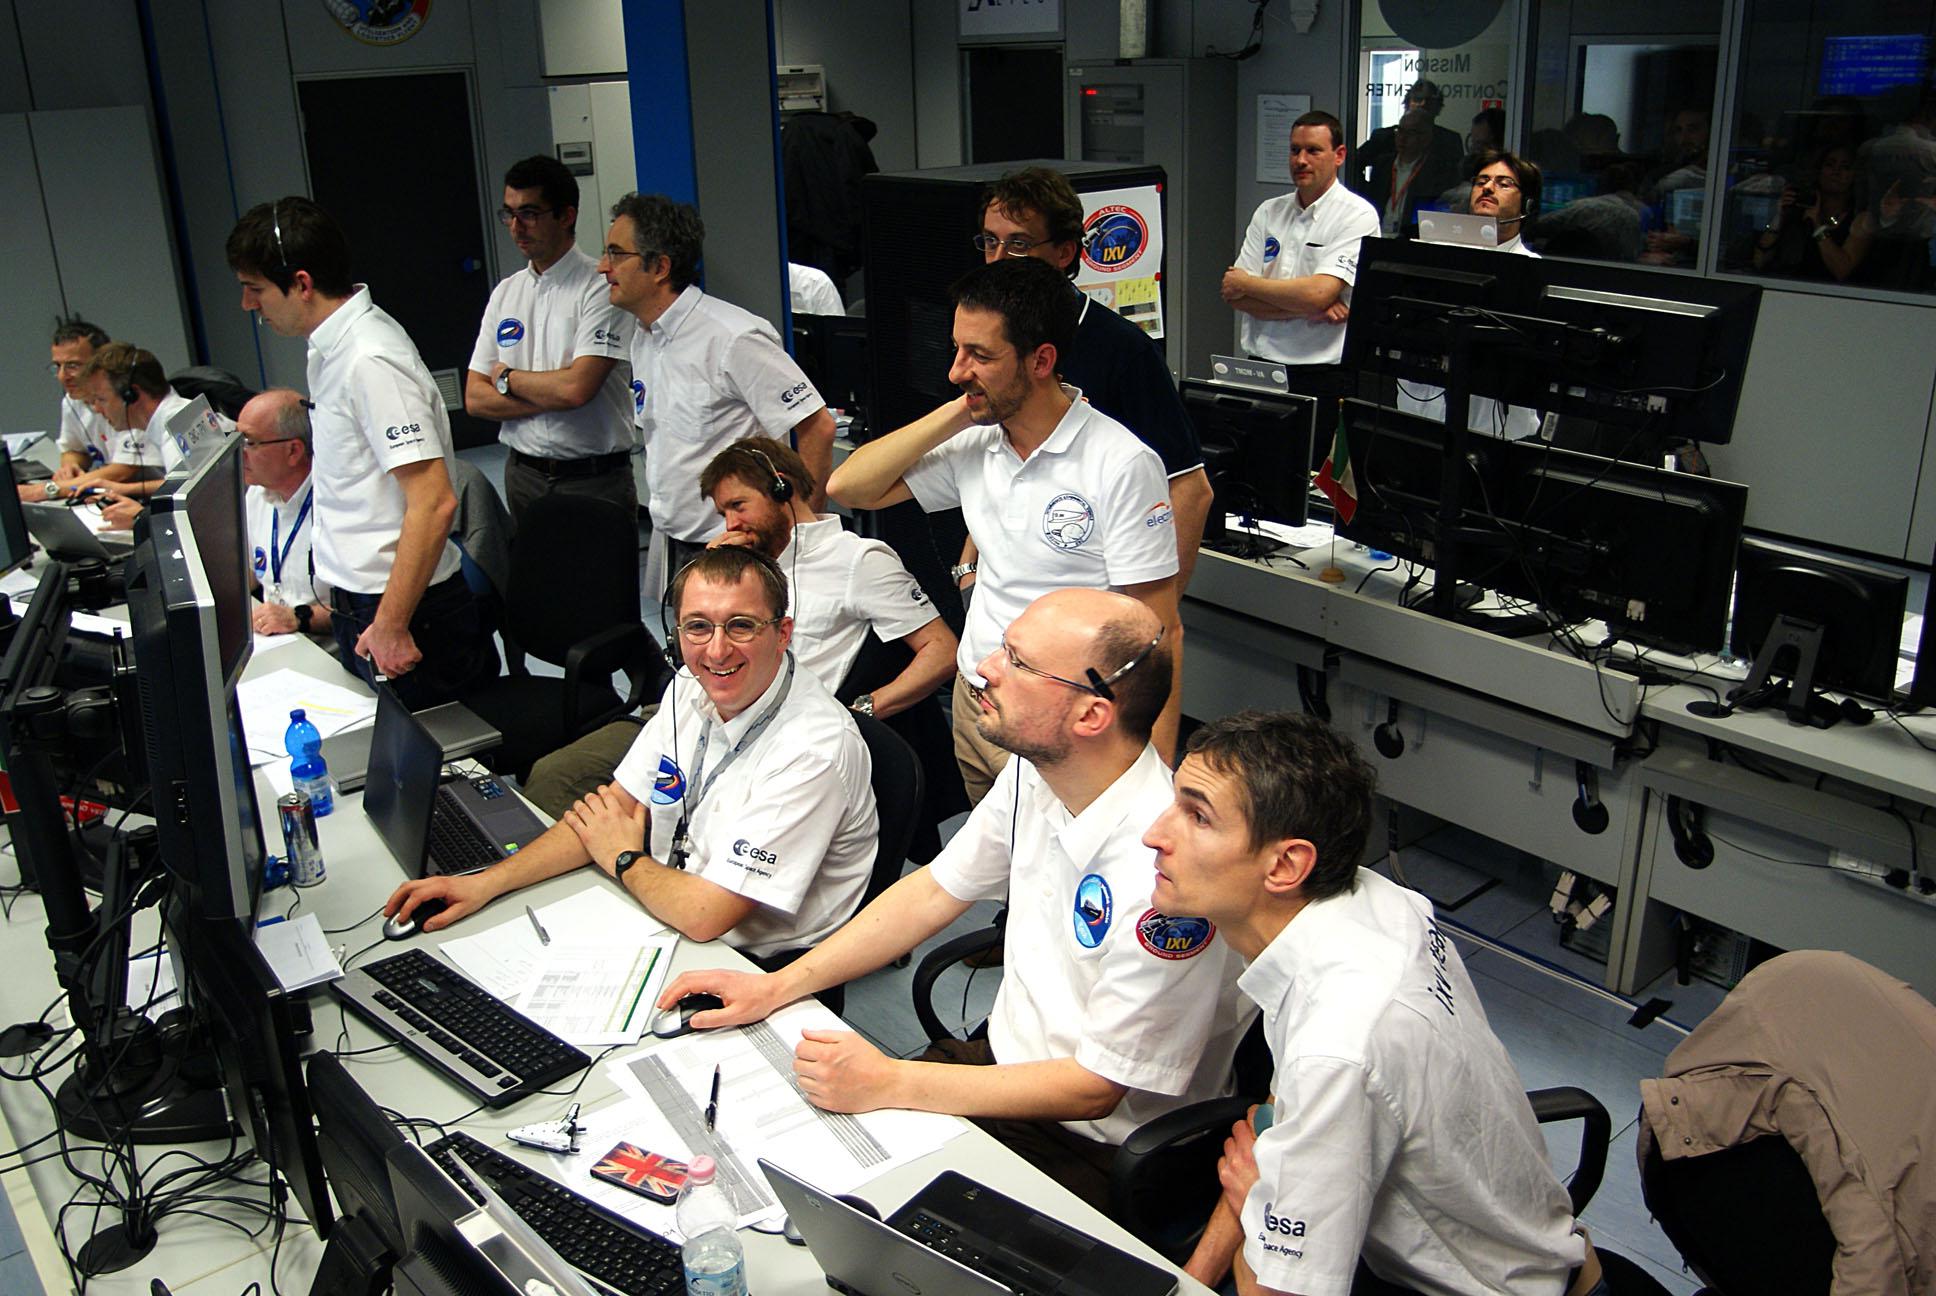 Mission control Turin watches for splashdown Credit: ESA/P. Shlyaev